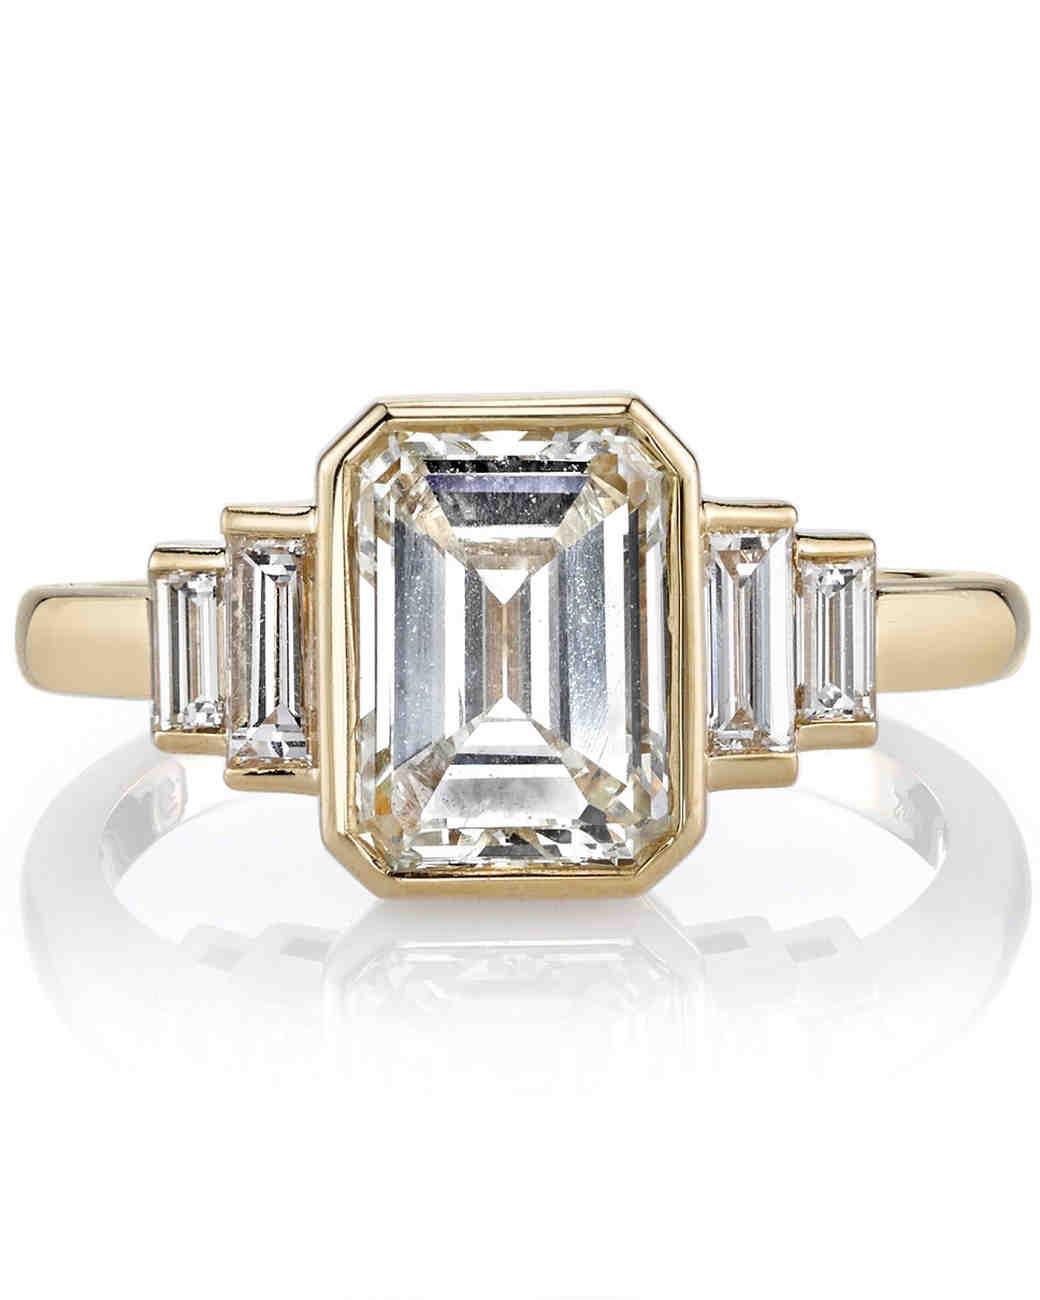 Emerald Cut Wedding Rings 010 - Emerald Cut Wedding Rings